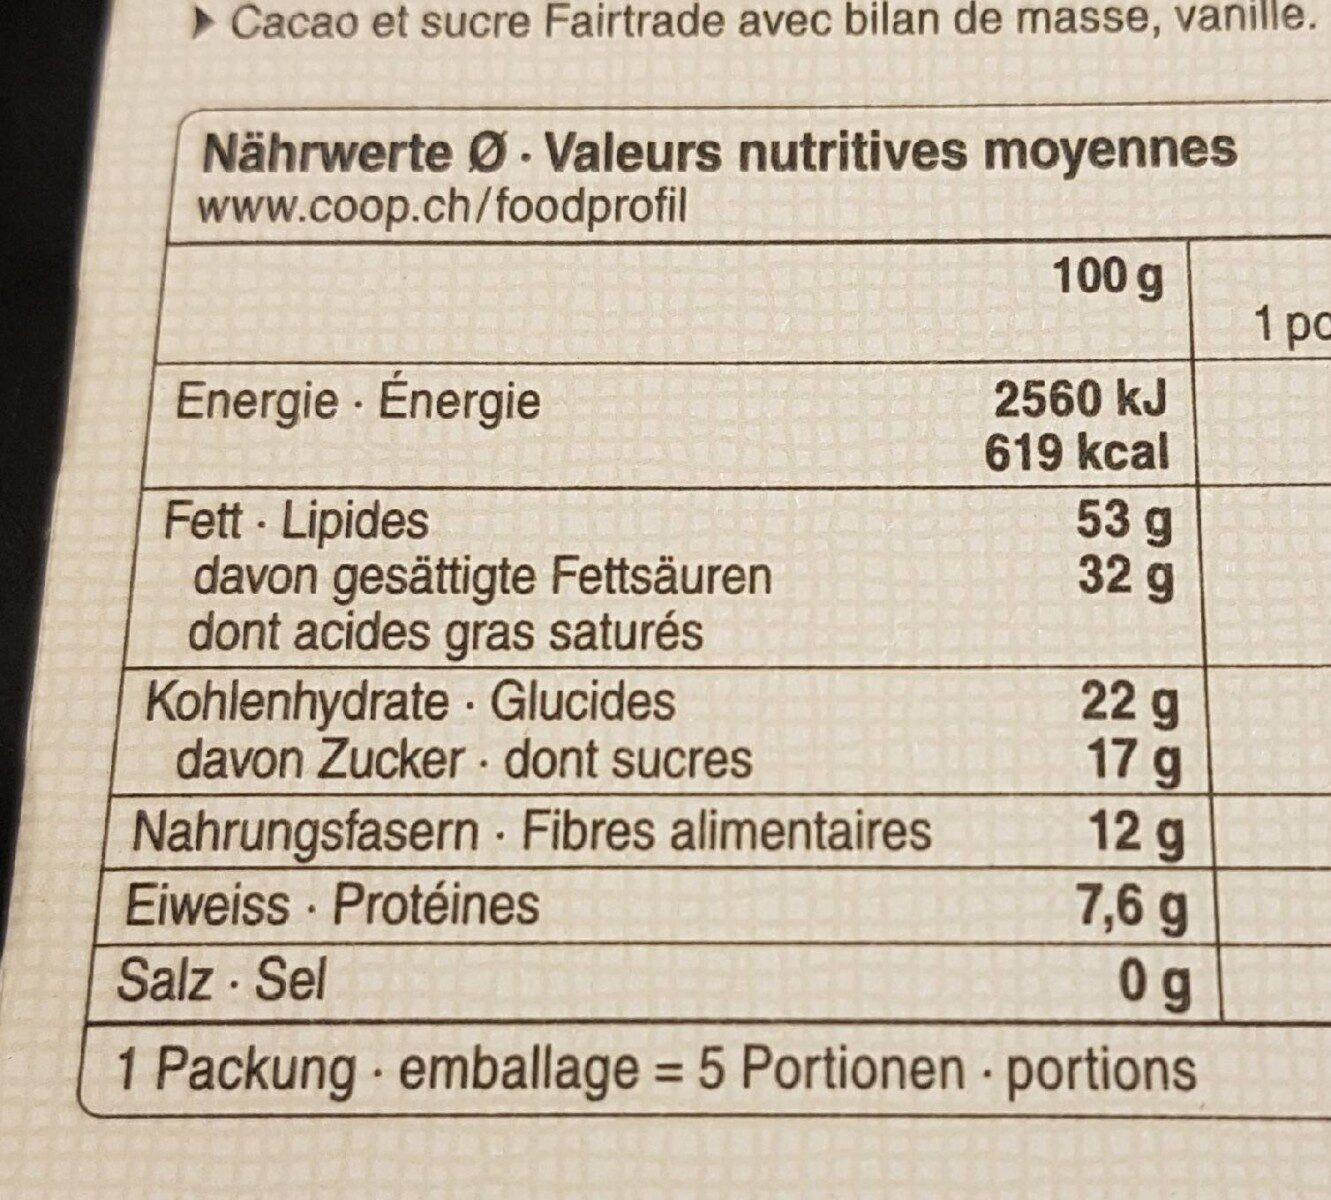 Chocolat noir 82% madagascar - Voedingswaarden - fr